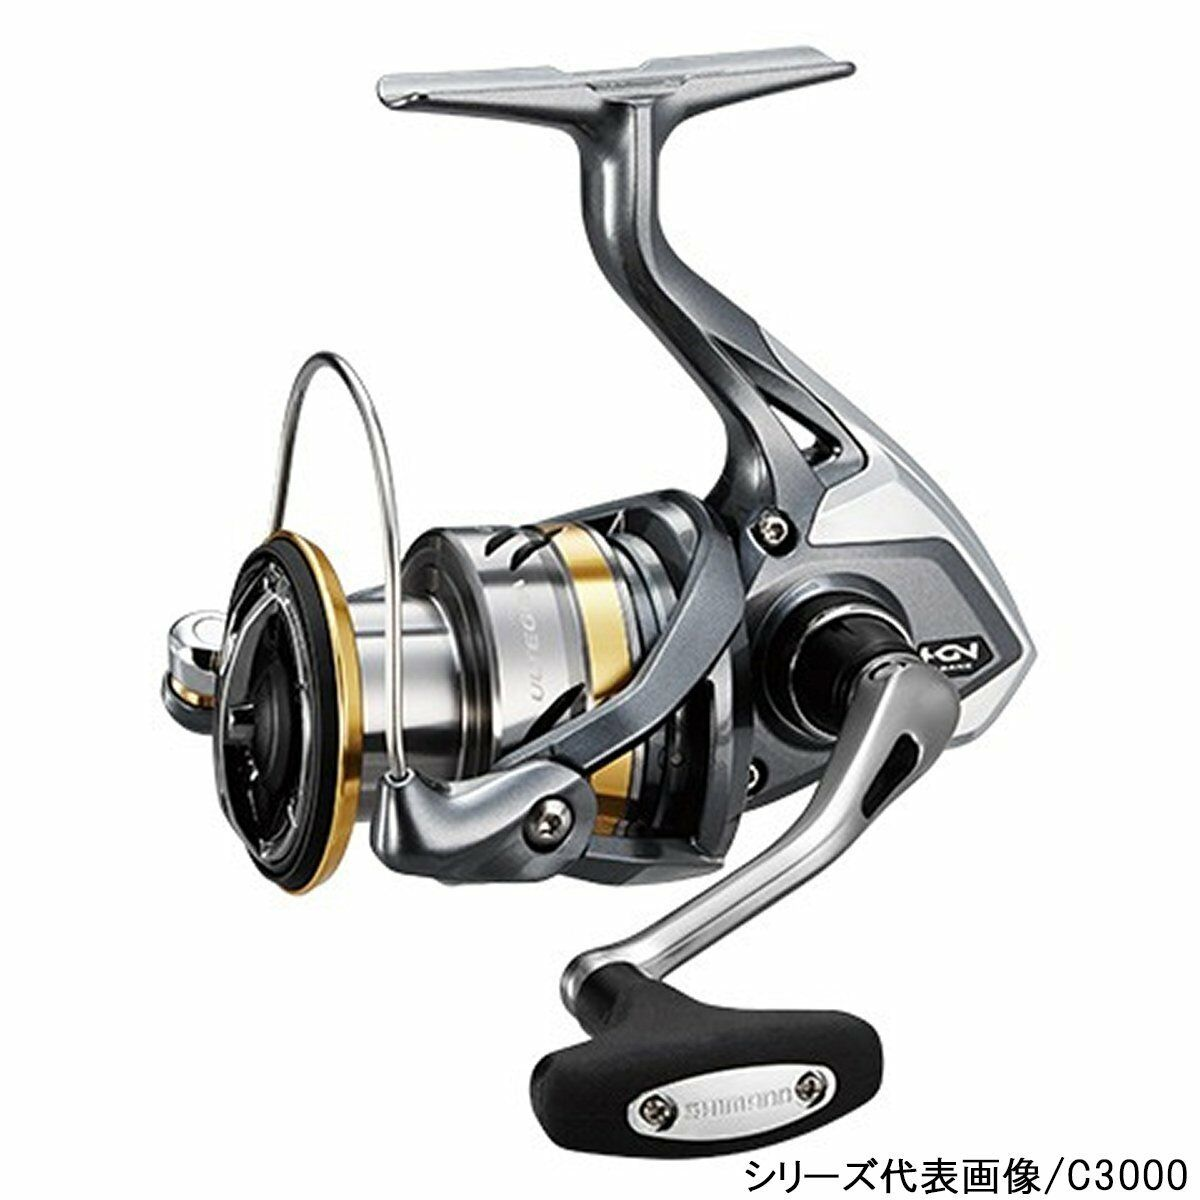 Shimano Shimano Shimano 17 Ultegra 4000 Spinning Reel 4969363036483 9ffae5